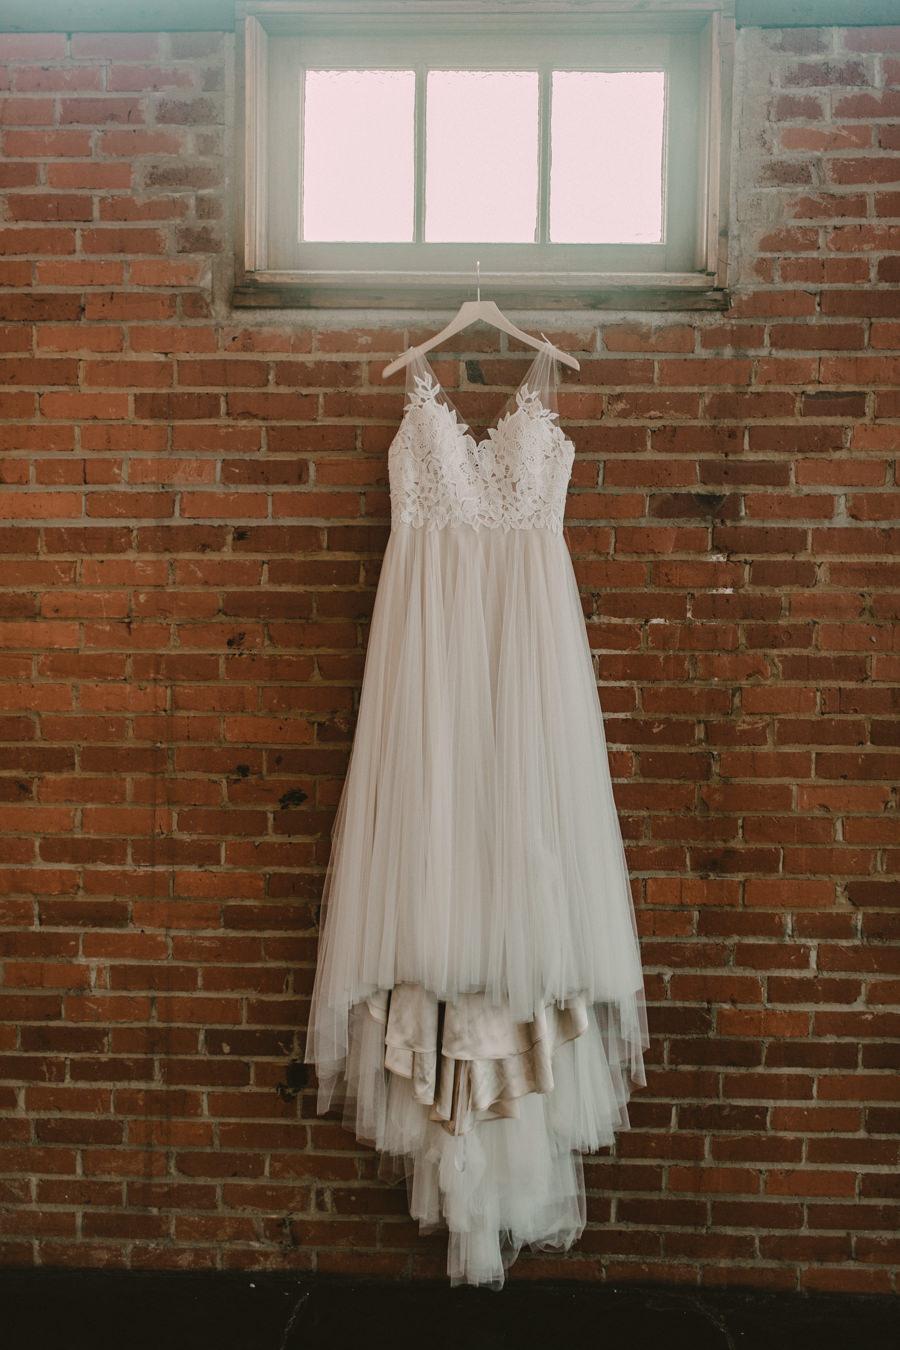 VeronicaandGarrett's Industrial Cavu Tampa Heights Wedding BHLDN gown Salt Block Hospitality Fancy Free Nursery Foundation Coffee-8.jpg